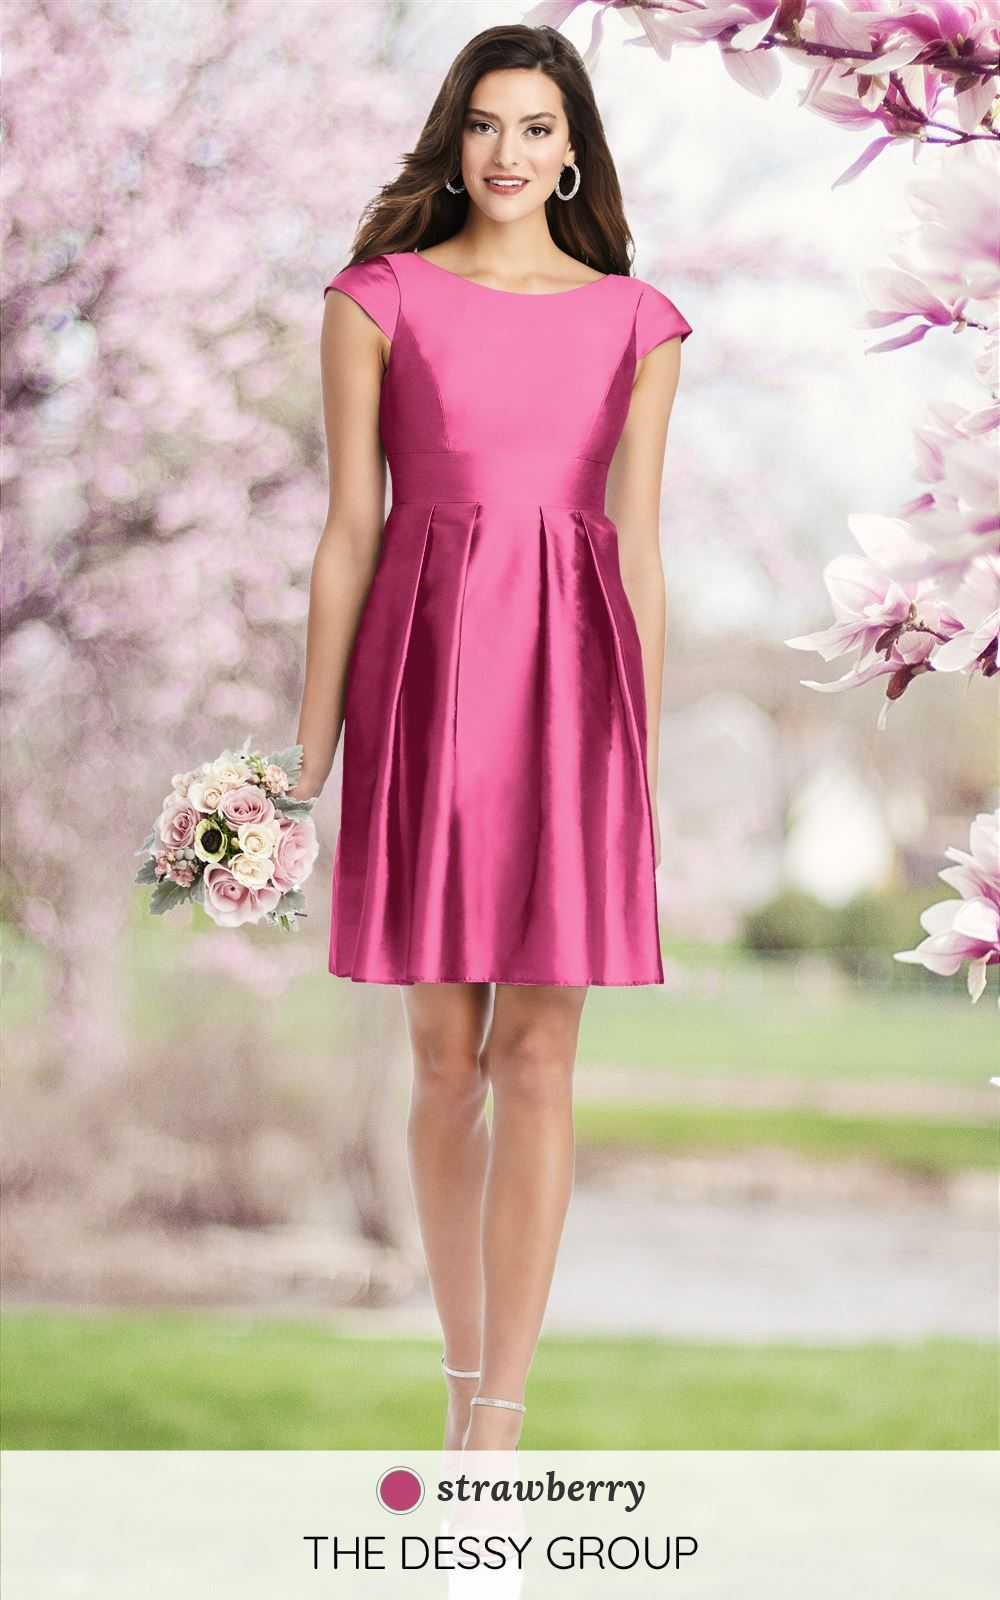 Stunning Fuchsia Pink Bridesmaid Dresses Pink Bridesmaid Dresses Short Pink Bridesmaid Dresses Fuchsia Bridesmaid Dresses [ 1600 x 1000 Pixel ]